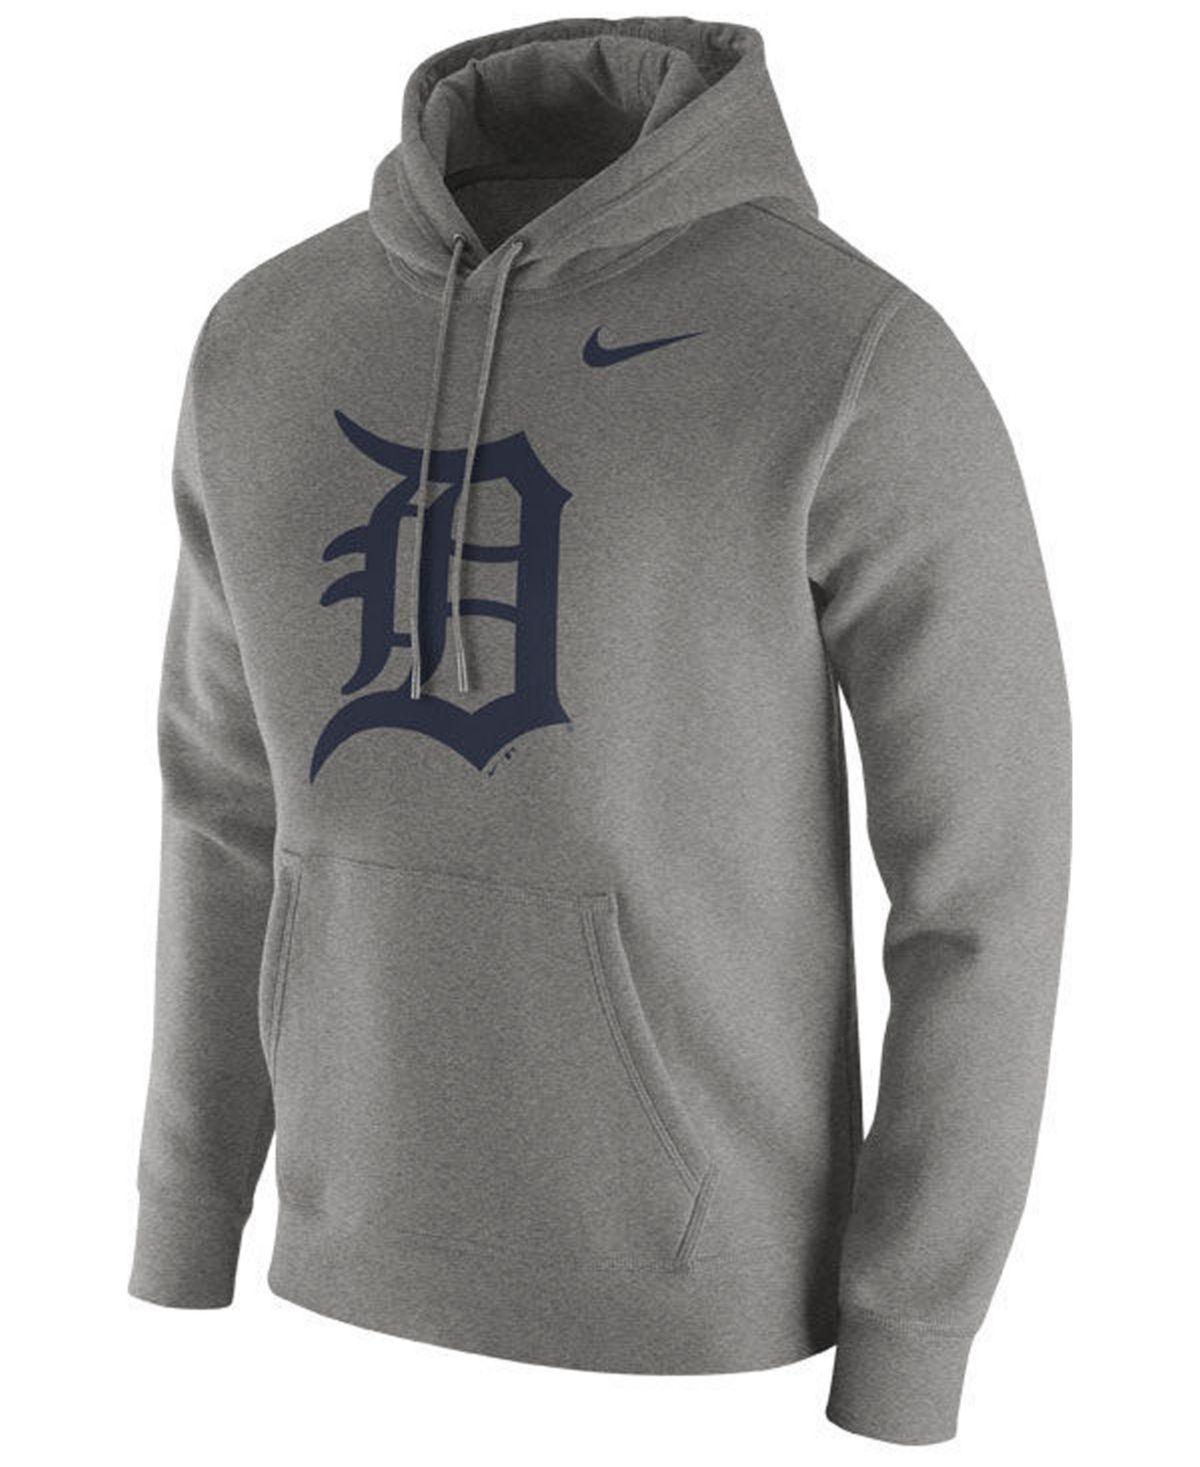 Nike Men S Detroit Tigers Franchise Hoodie Gray Nike Men Hoodies Boston Red Sox [ 1467 x 1200 Pixel ]